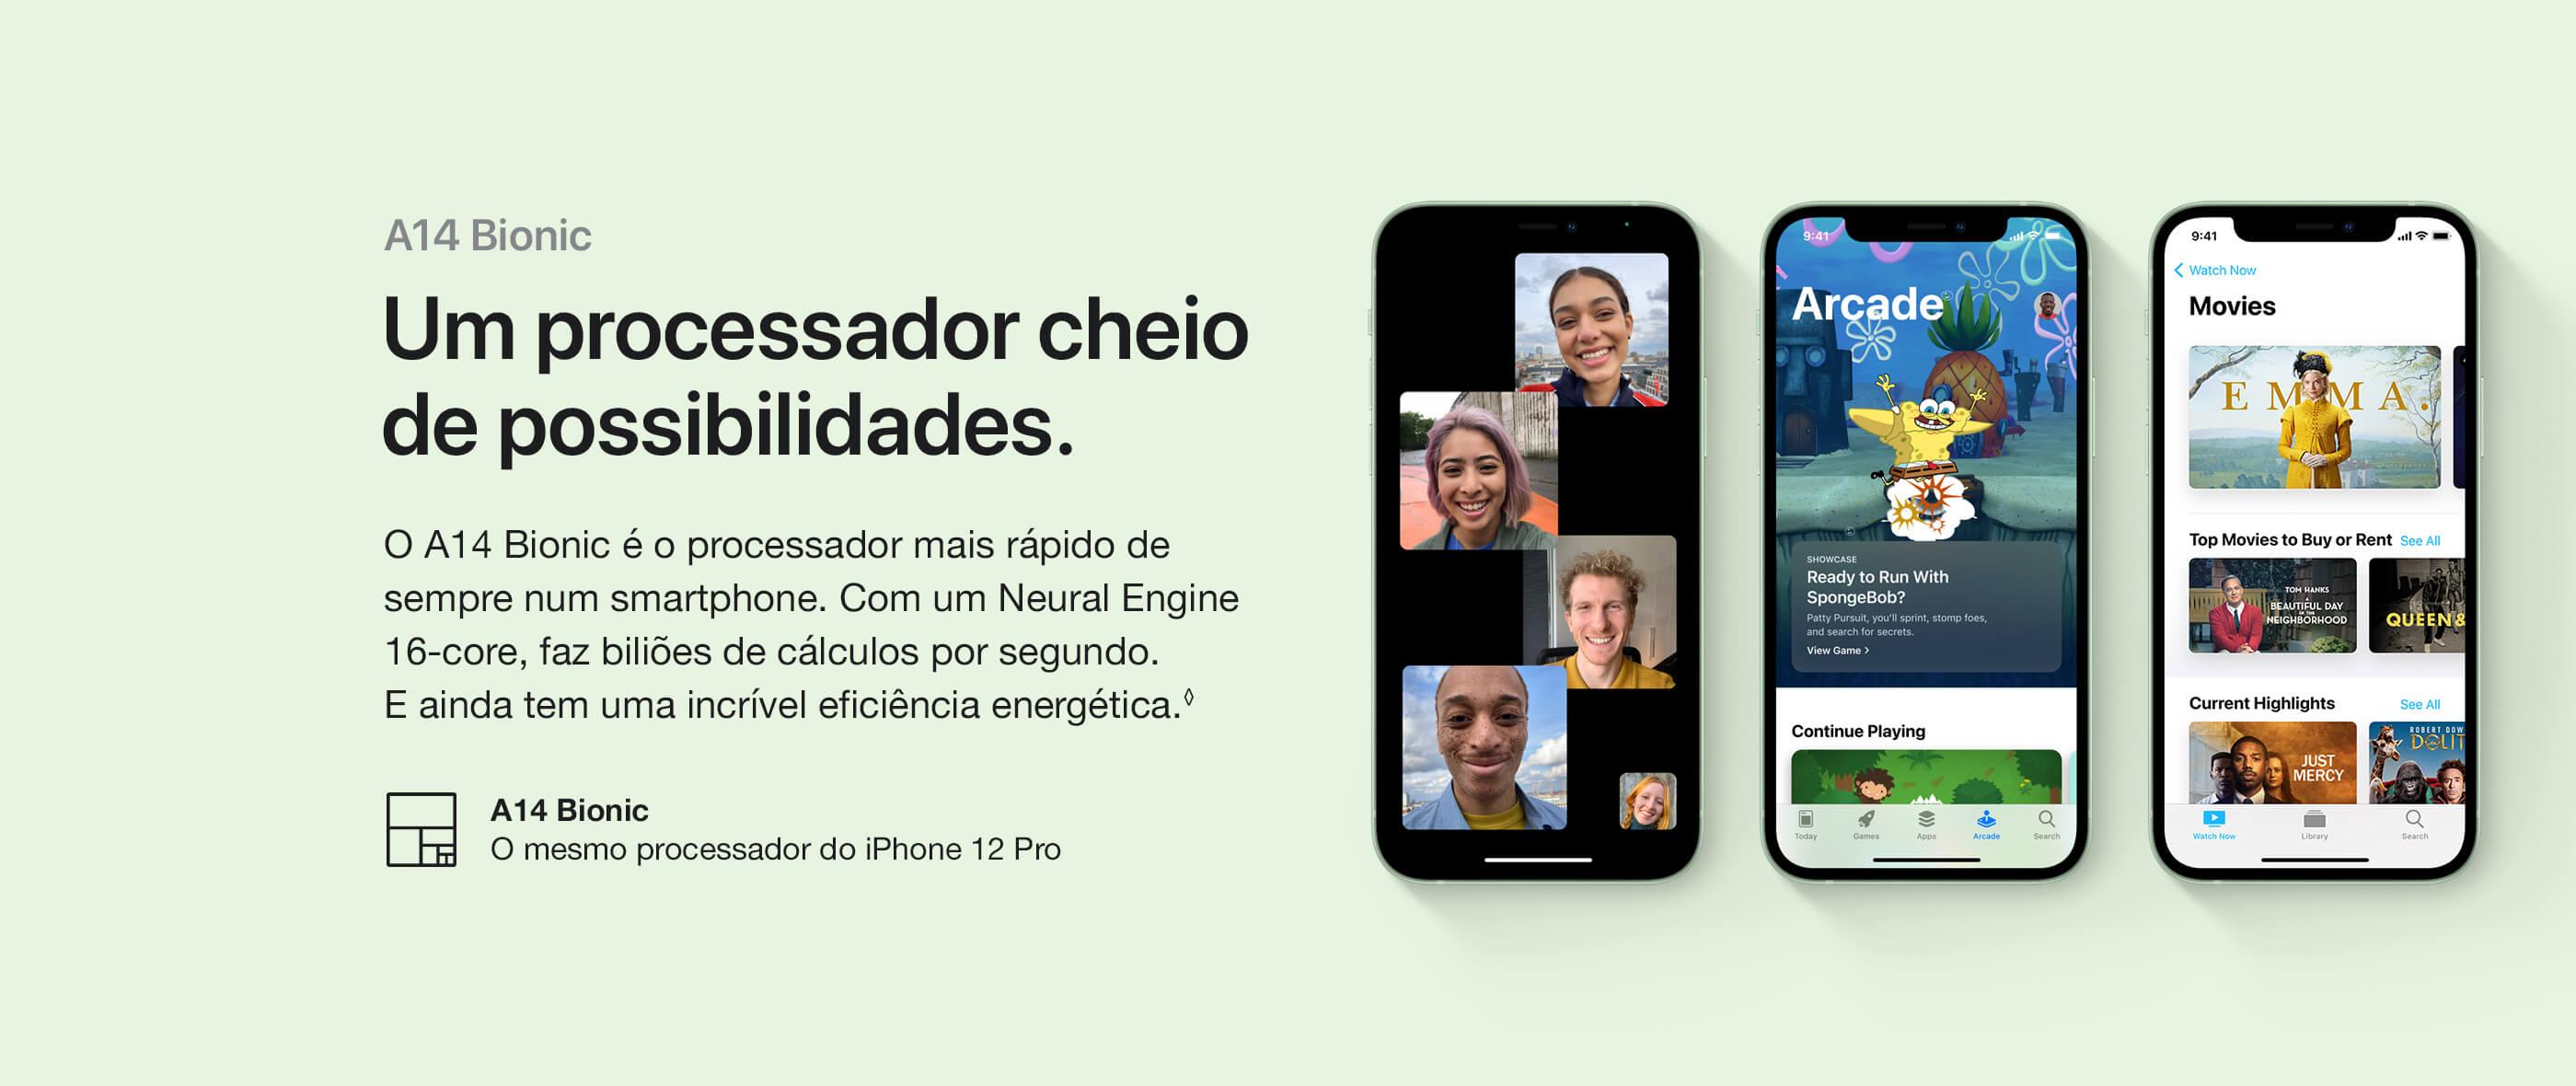 iPhone 12 e iPhone 12 Mini Processador A14 Bionic